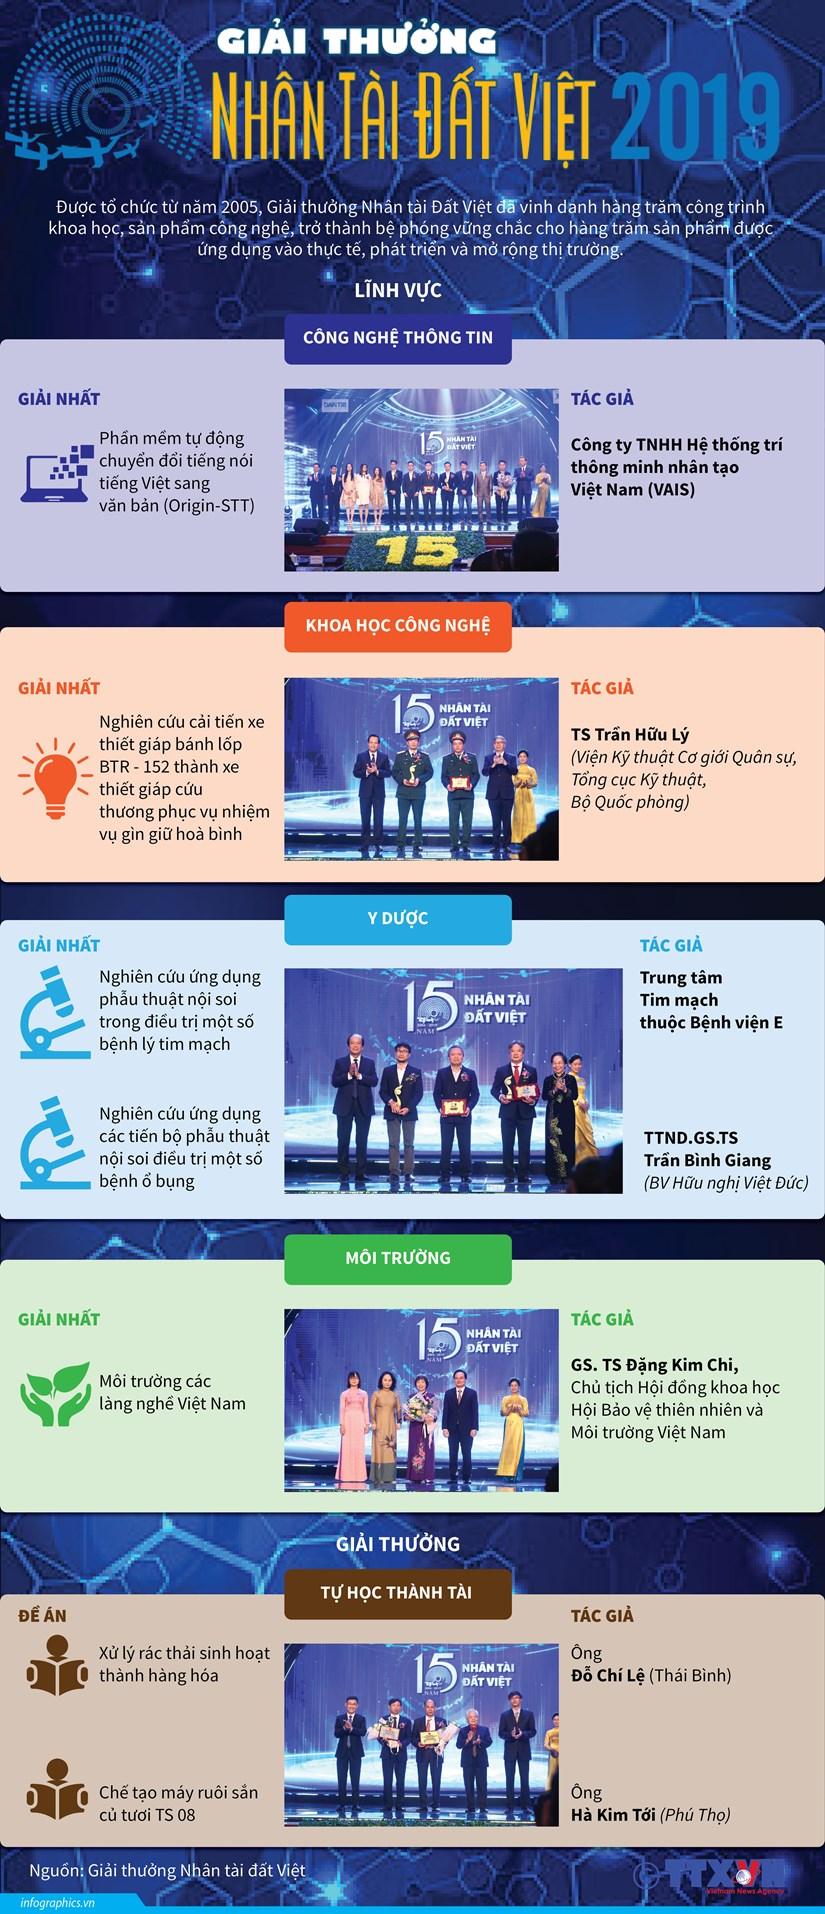 [Infographics] Chi tiet giai thuong Nhan tai Dat Viet nam 2019 hinh anh 1